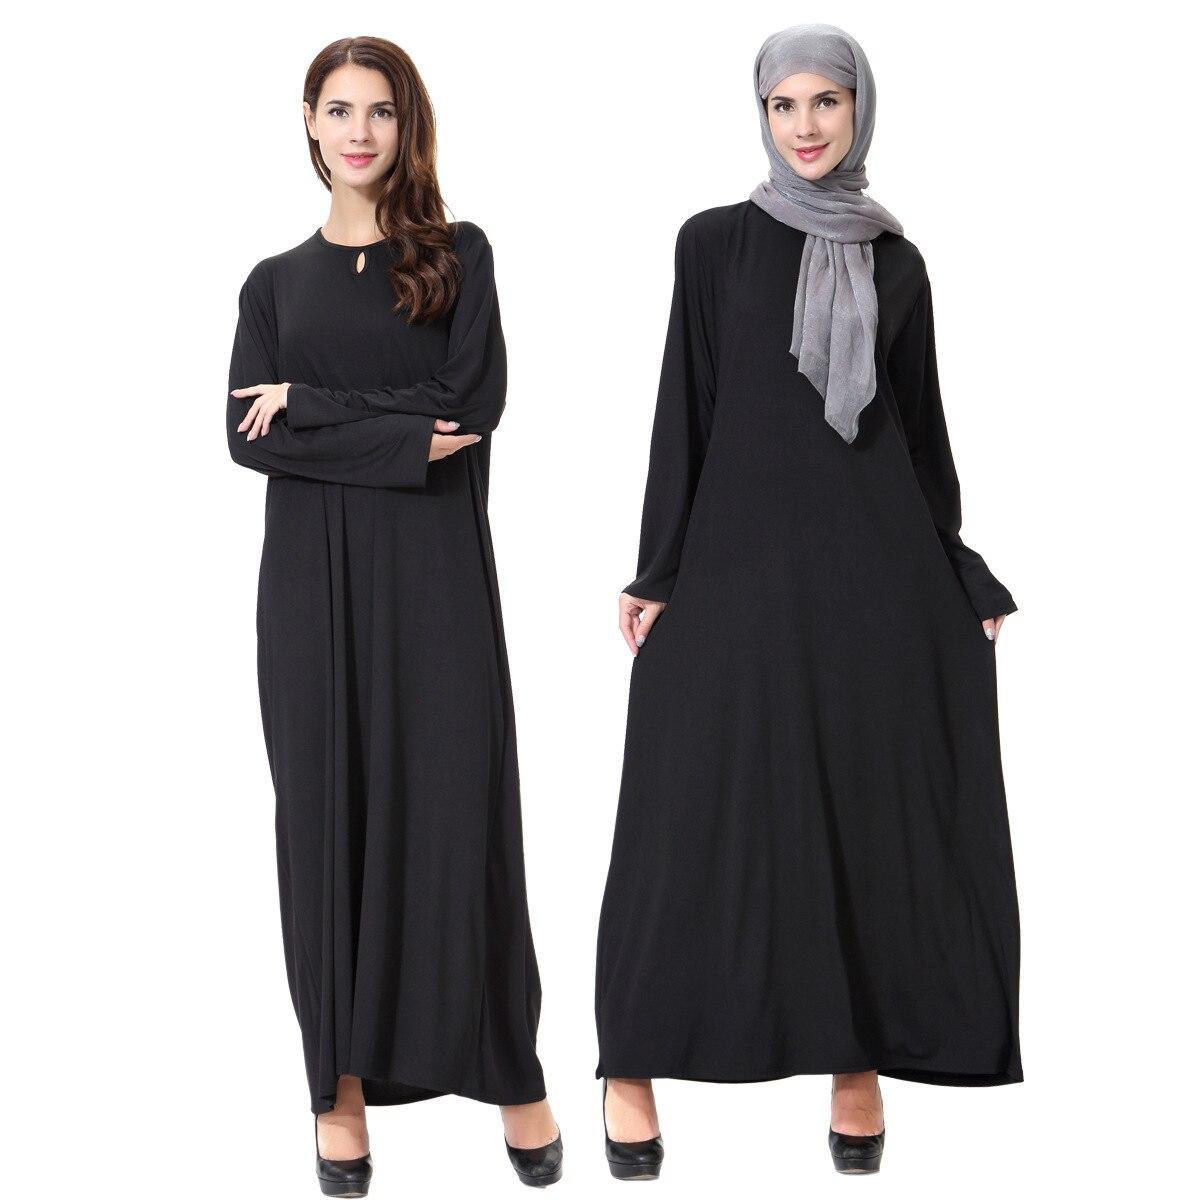 Ramadan Muslim Abaya Dress Women Dubai Black Loose Maxi Hijab Vestidos Robe Turkey Moroccan Kaftan Tunic Prayer Islamic Clothing